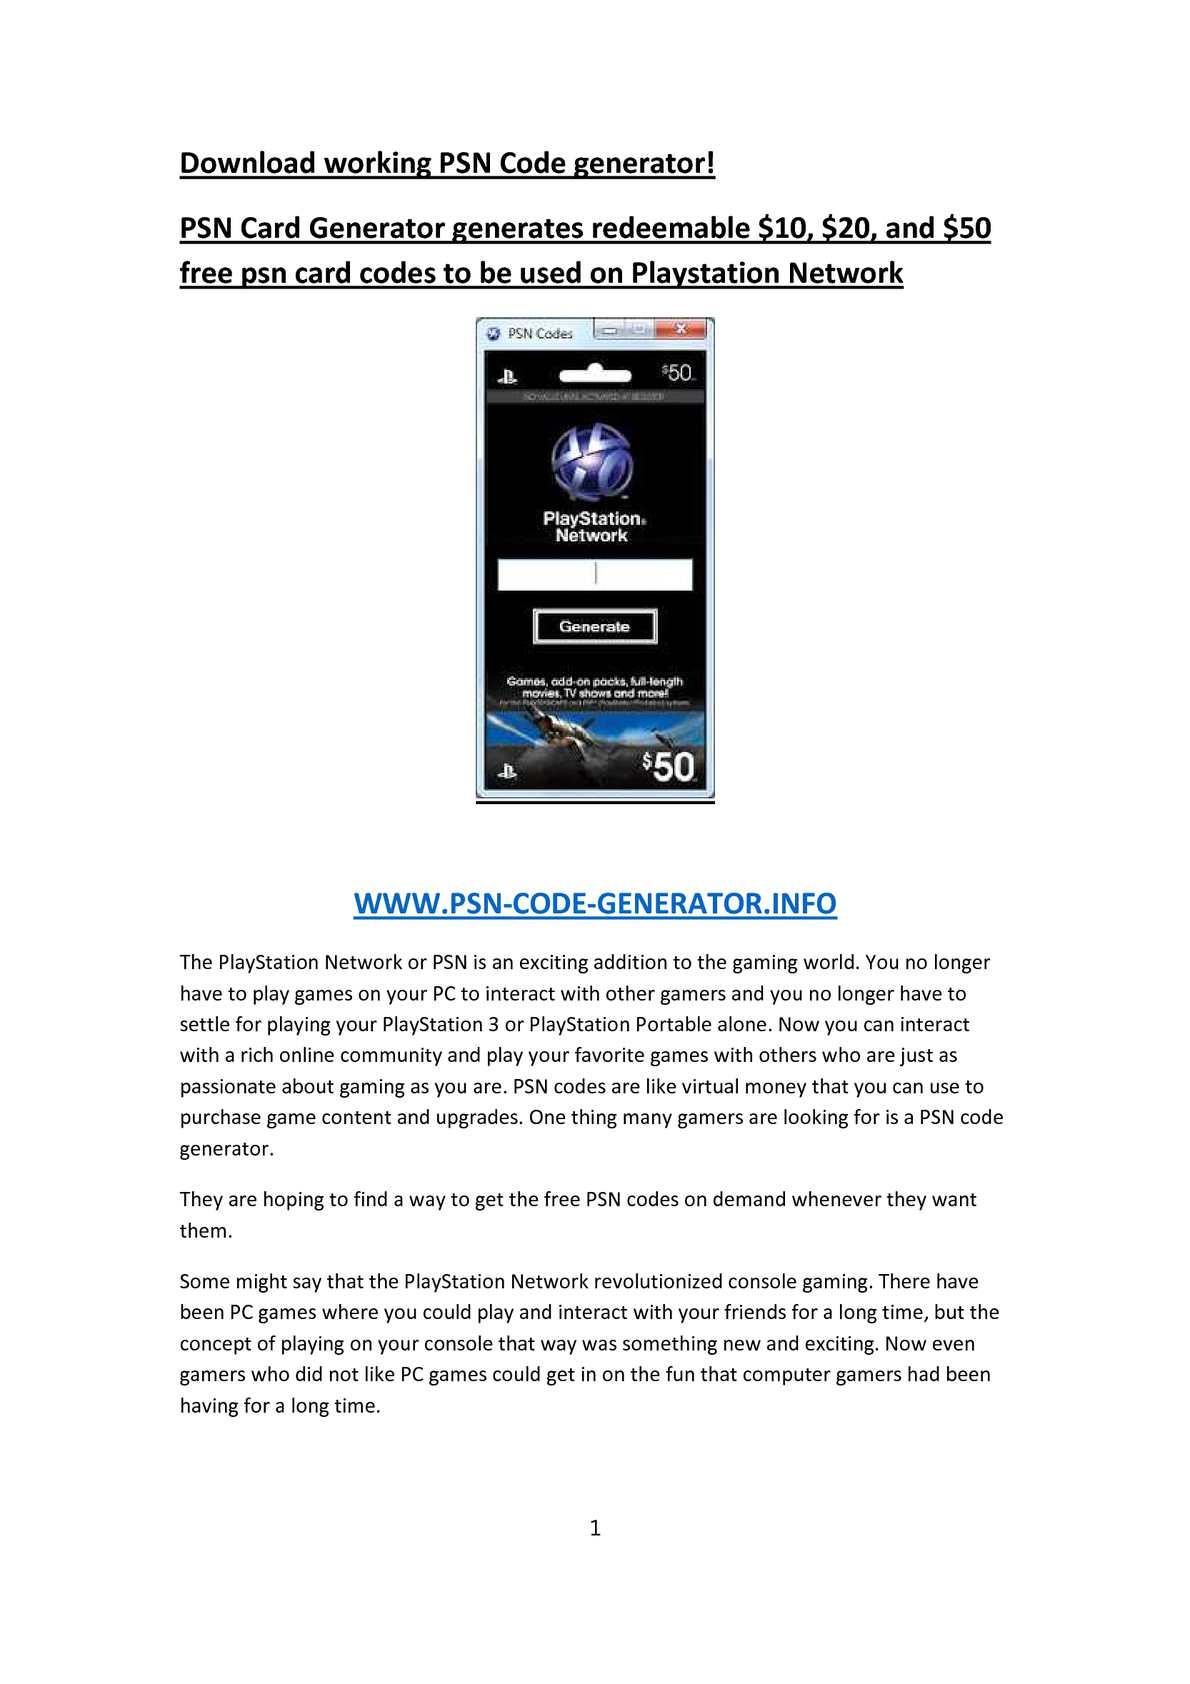 Calaméo - PSN-Code-Generator info - Download working PSN Code